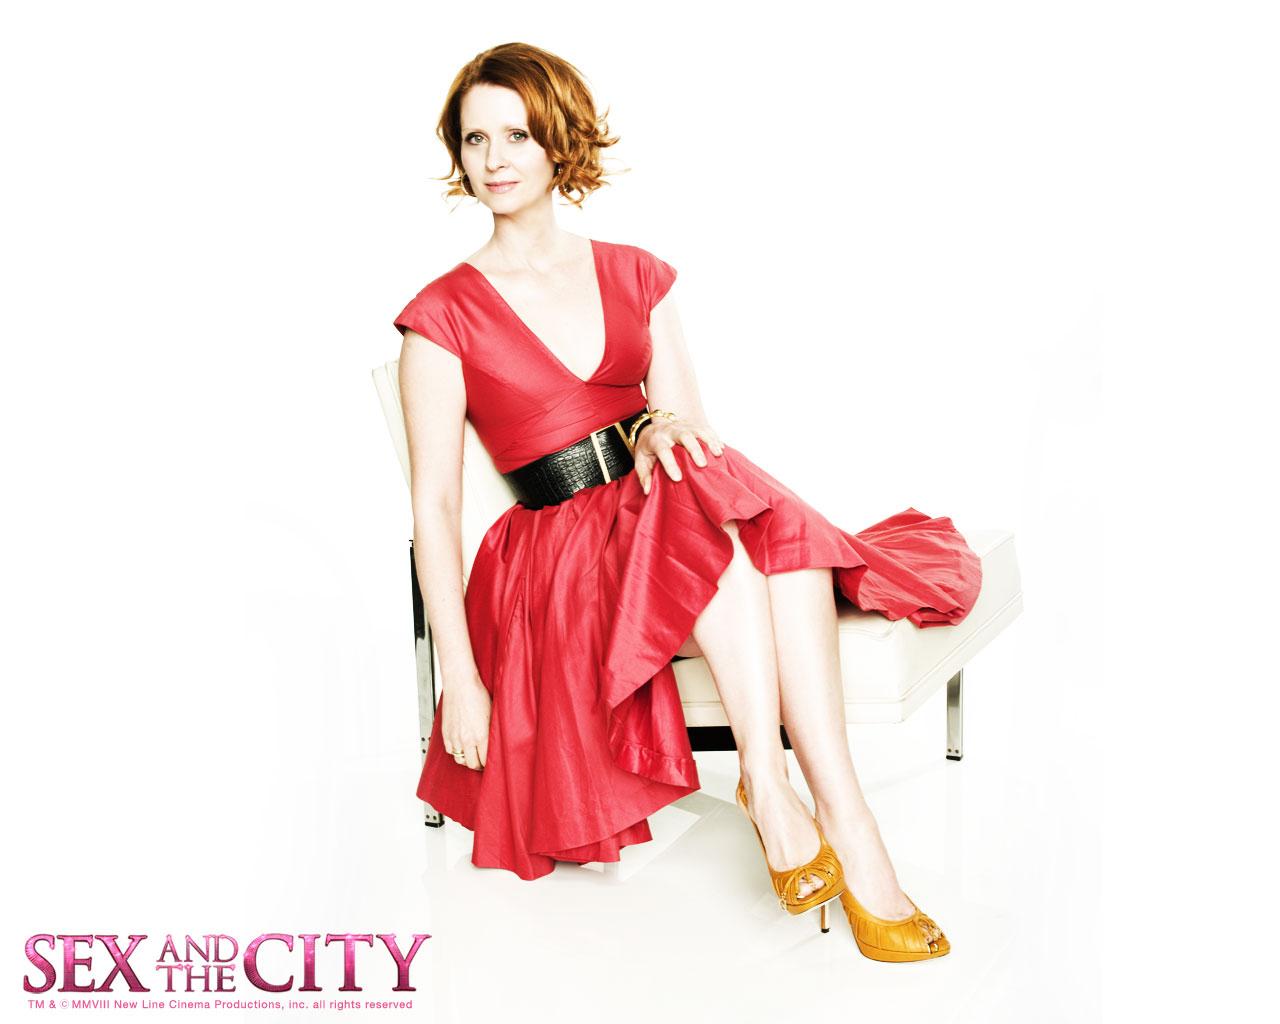 Miranda sex and the city